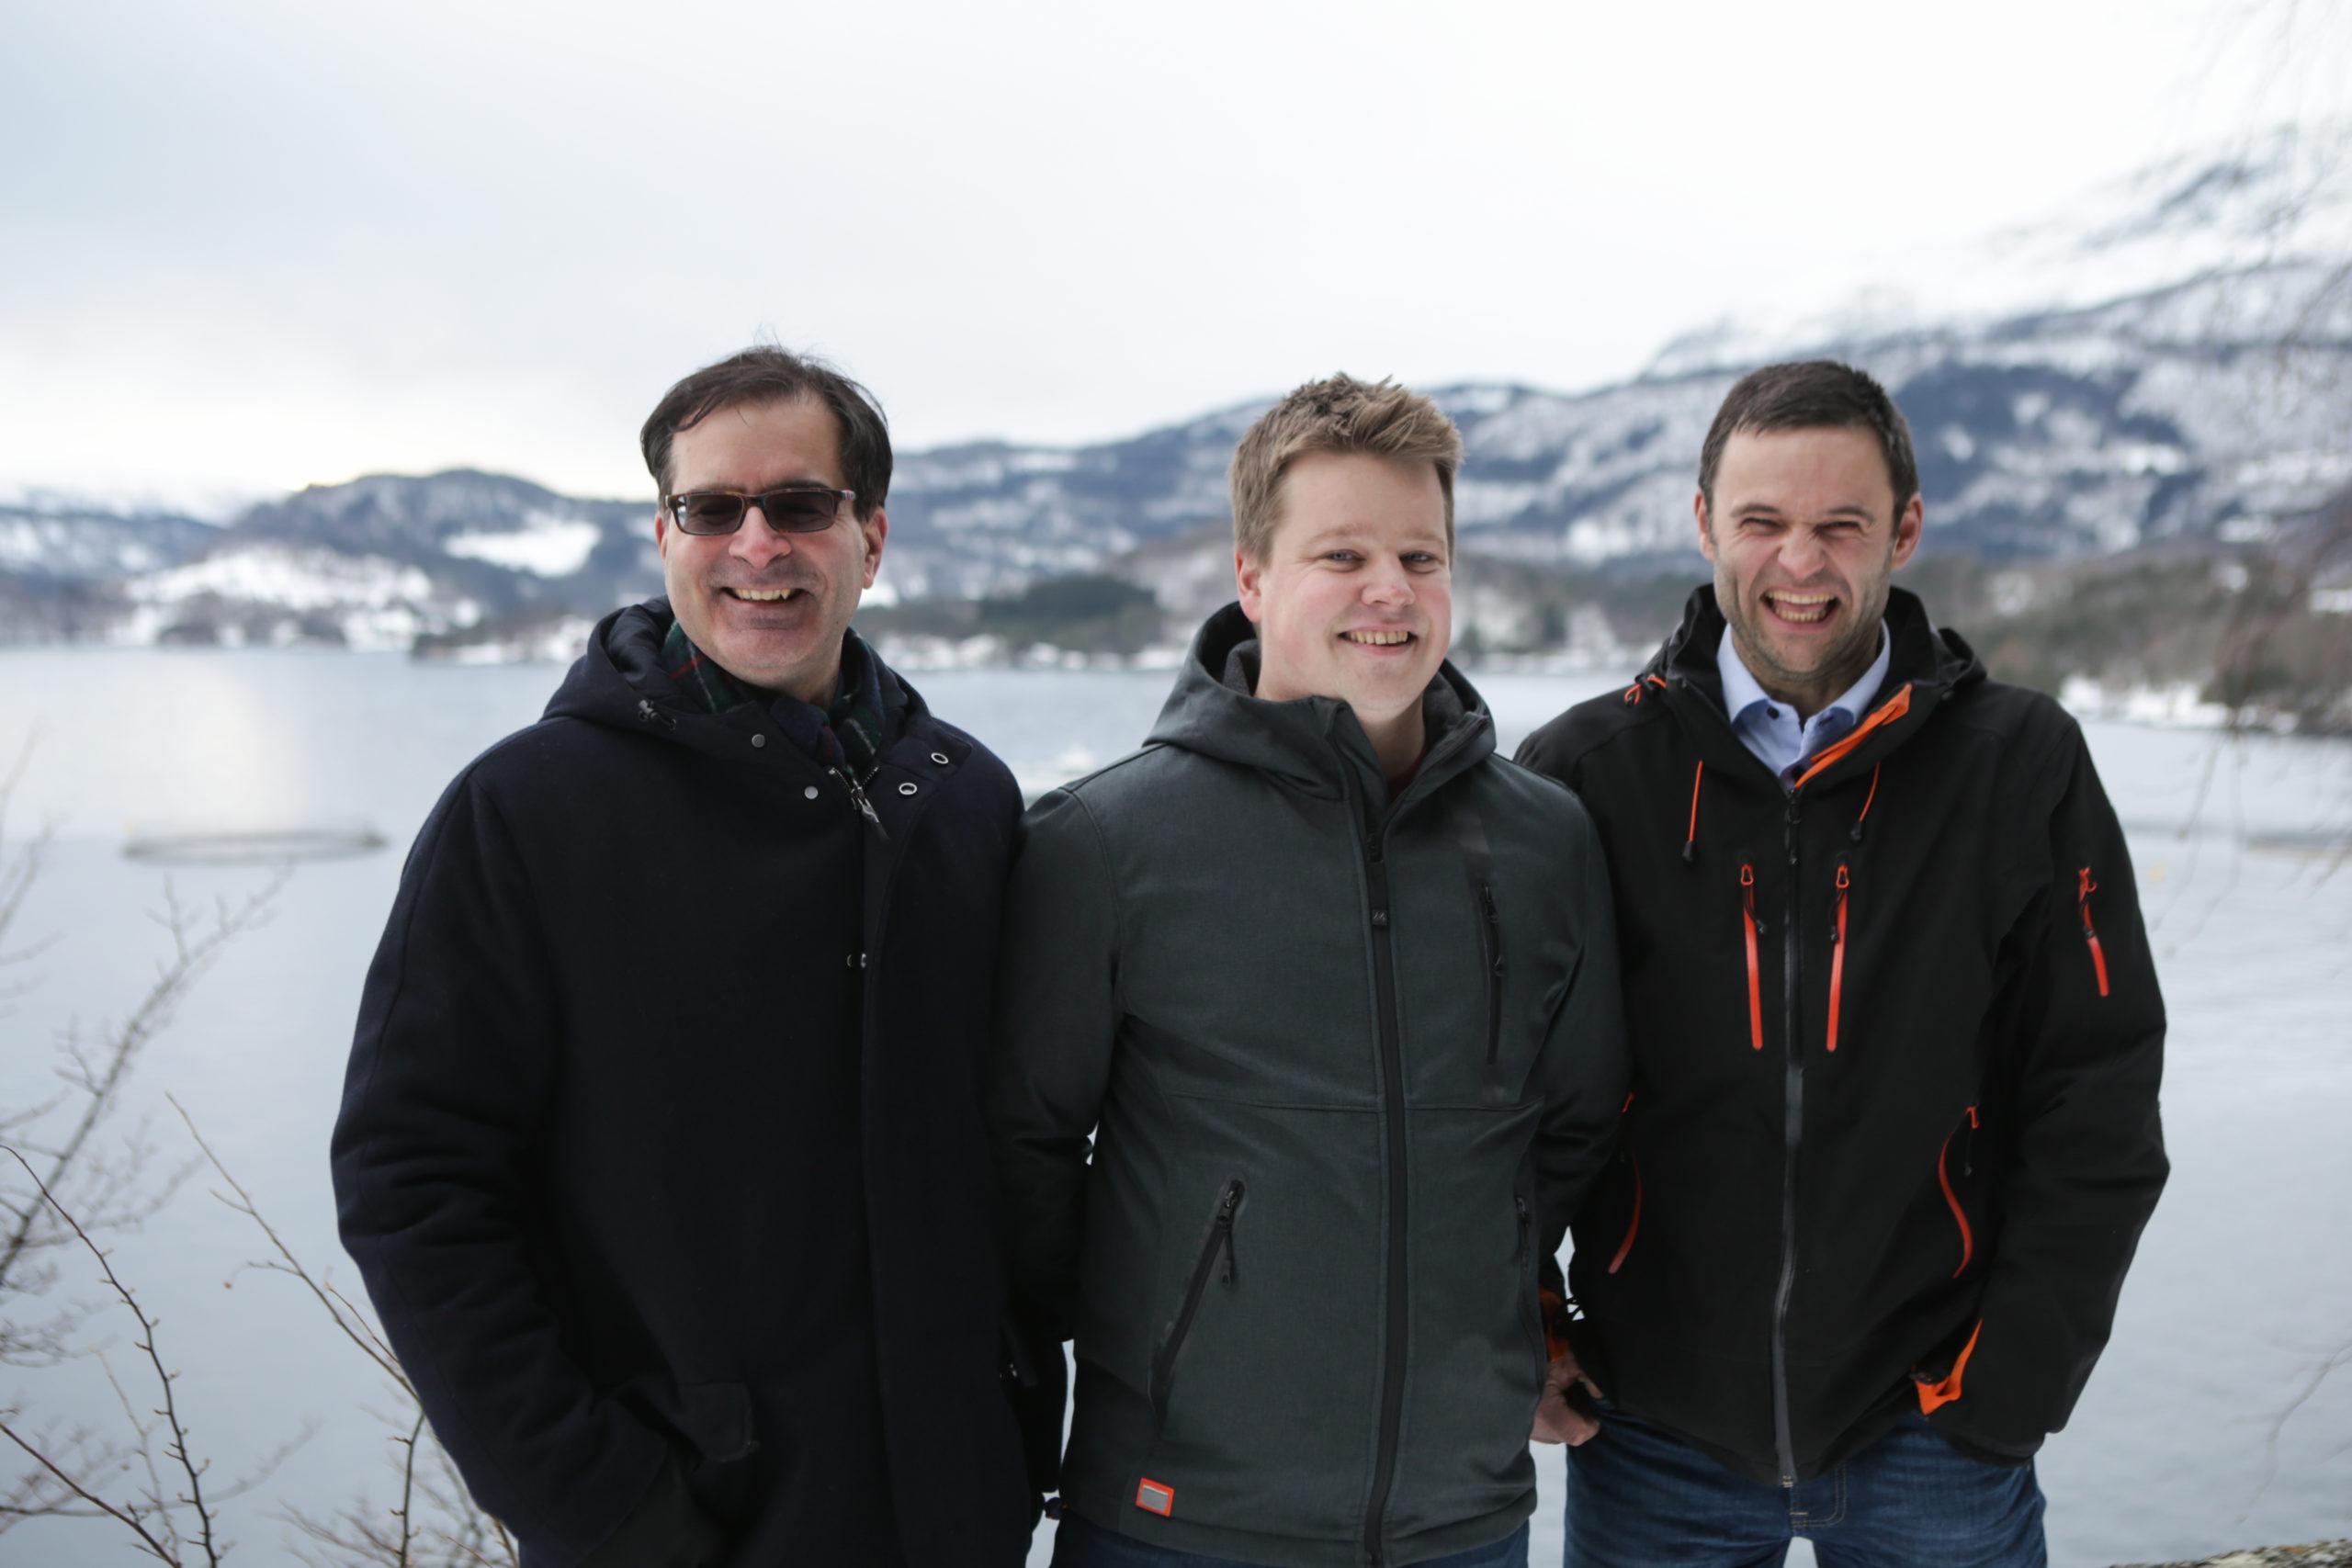 Karim Kurmaly (Administrerende direktør i Veramaris), Mads Martinsen (Skretting), Erlend Haugarvoll (Administrerende direktør Lingalaks). Foto: © Veramaris.